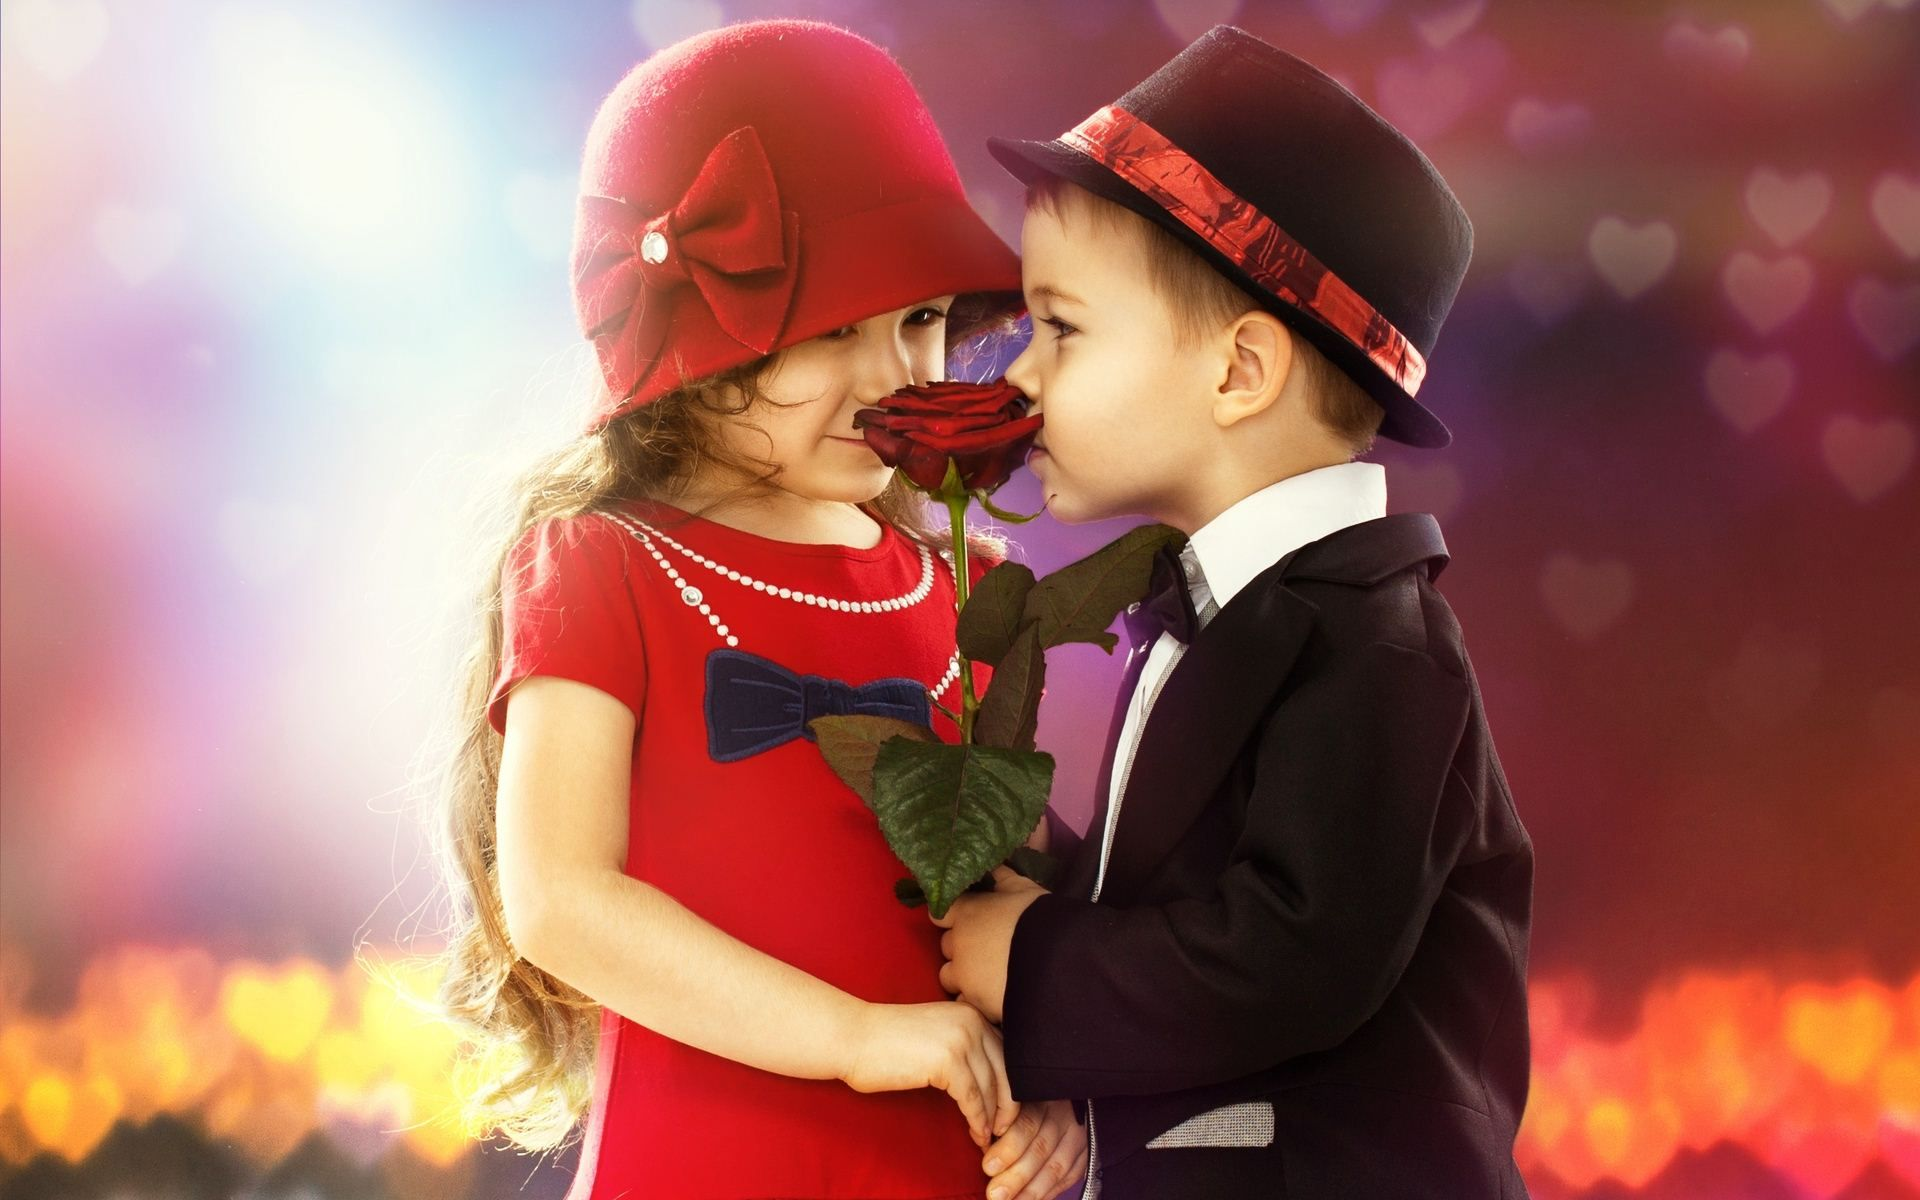 Pin By Tomeka Meme Napper On Love Kiss Images Couple Wallpaper Cute Kids